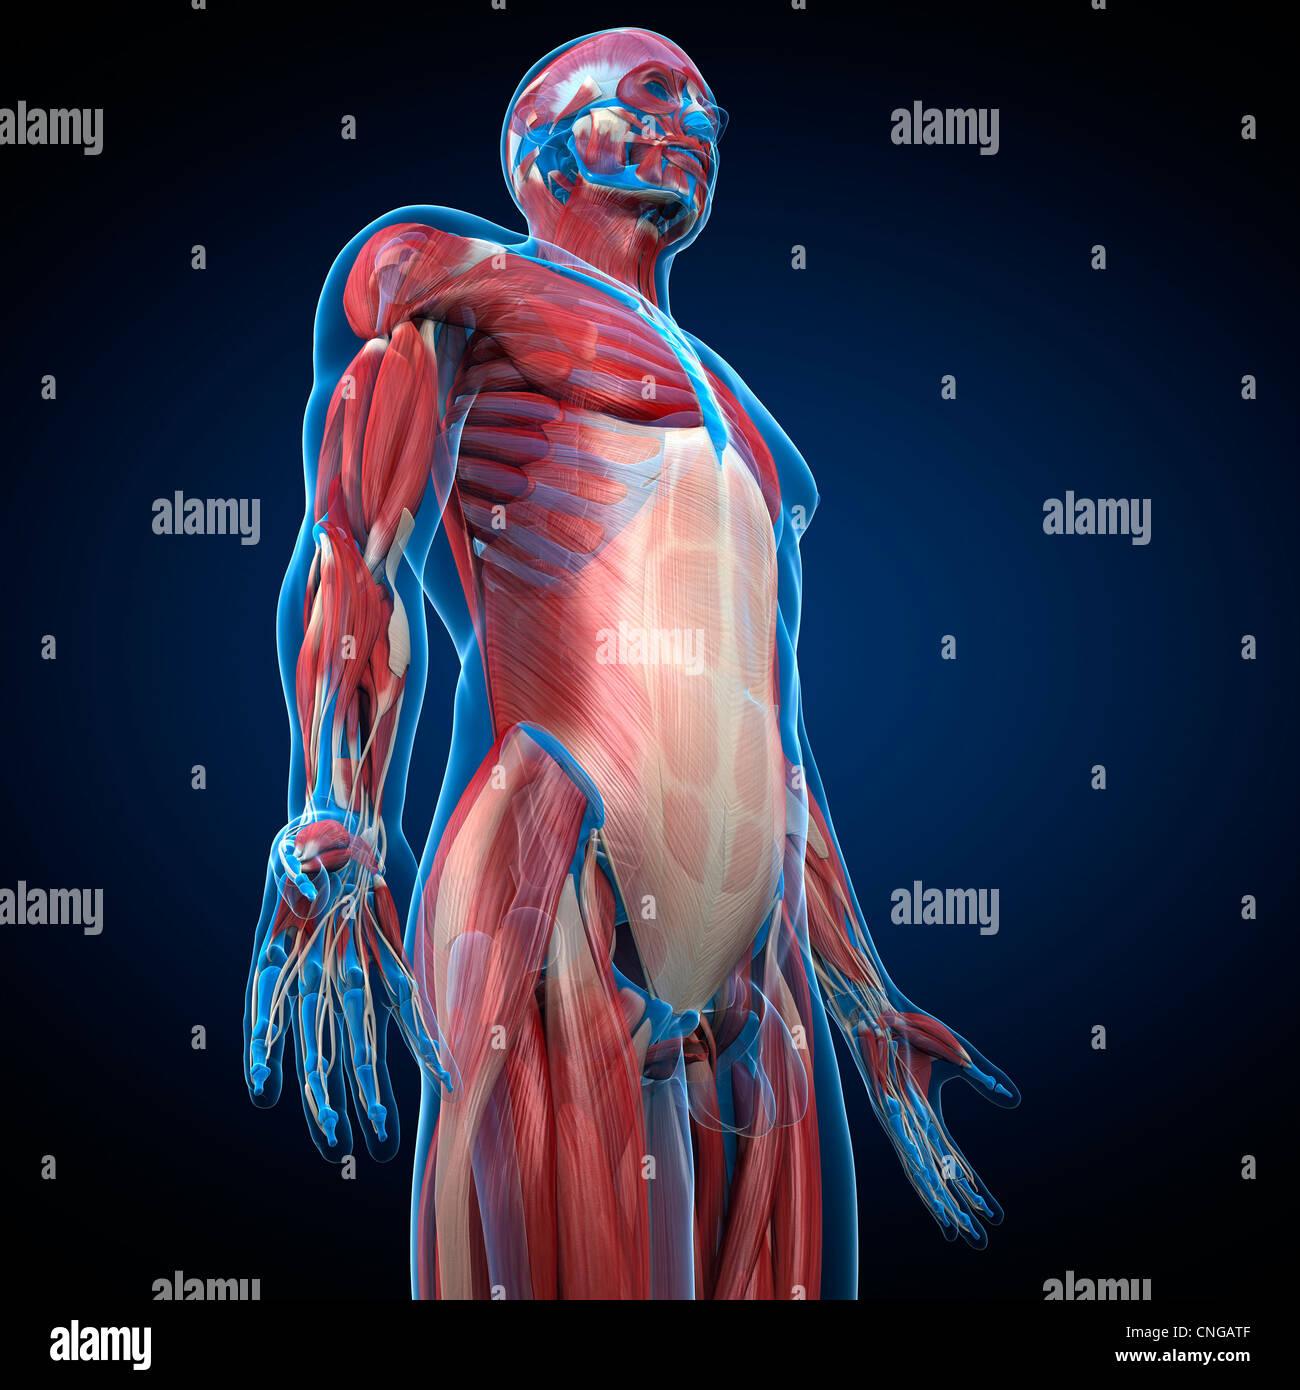 Male musculature  artwork - Stock Image